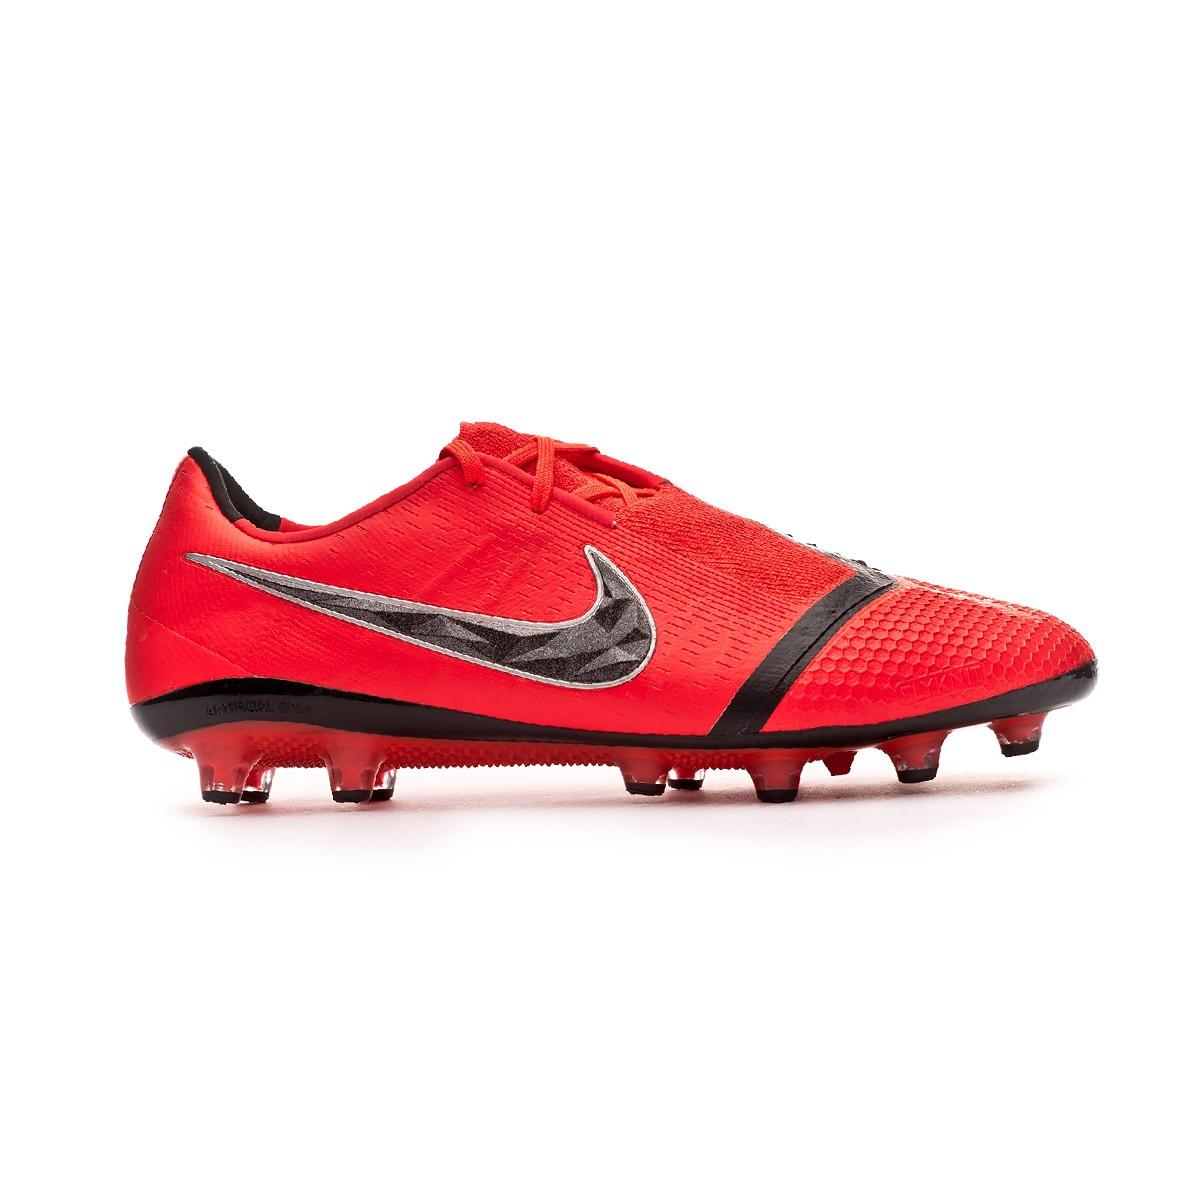 7b2f5601345 Football Boots Nike Phantom Venom Elite AG-Pro Bright crimson-Black -  Football store Fútbol Emotion